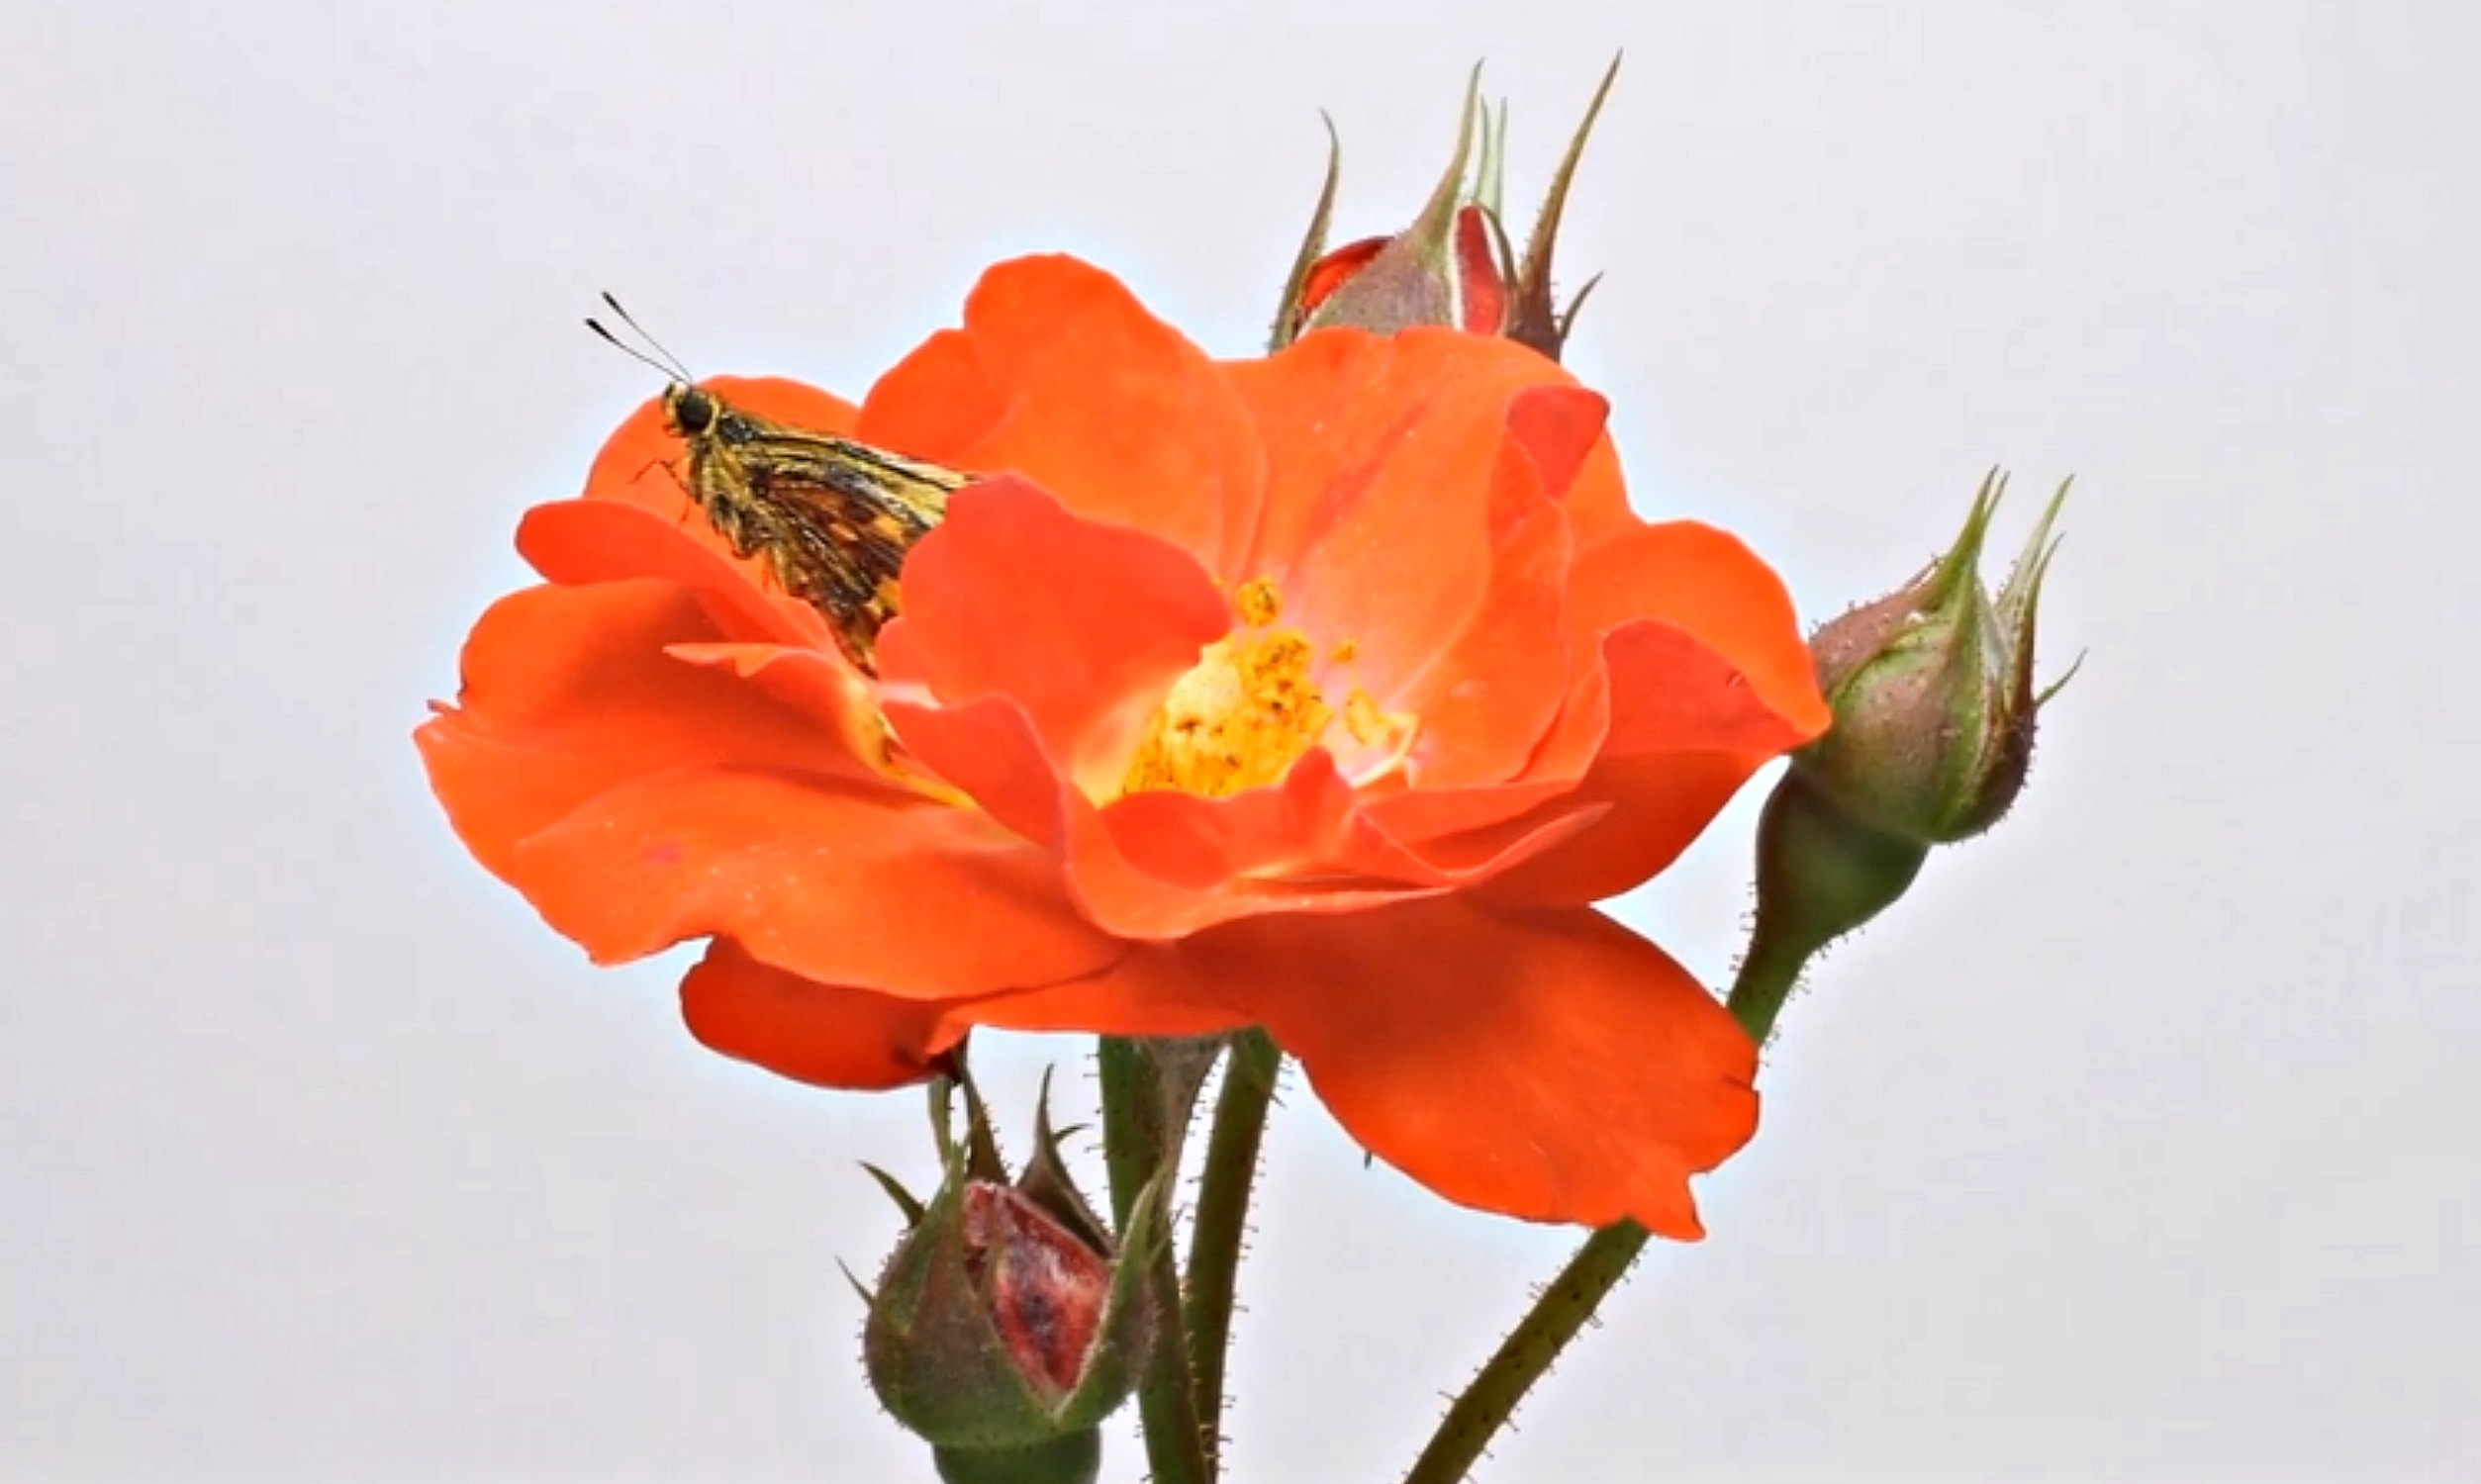 Umwelt – Flower Time Lapse